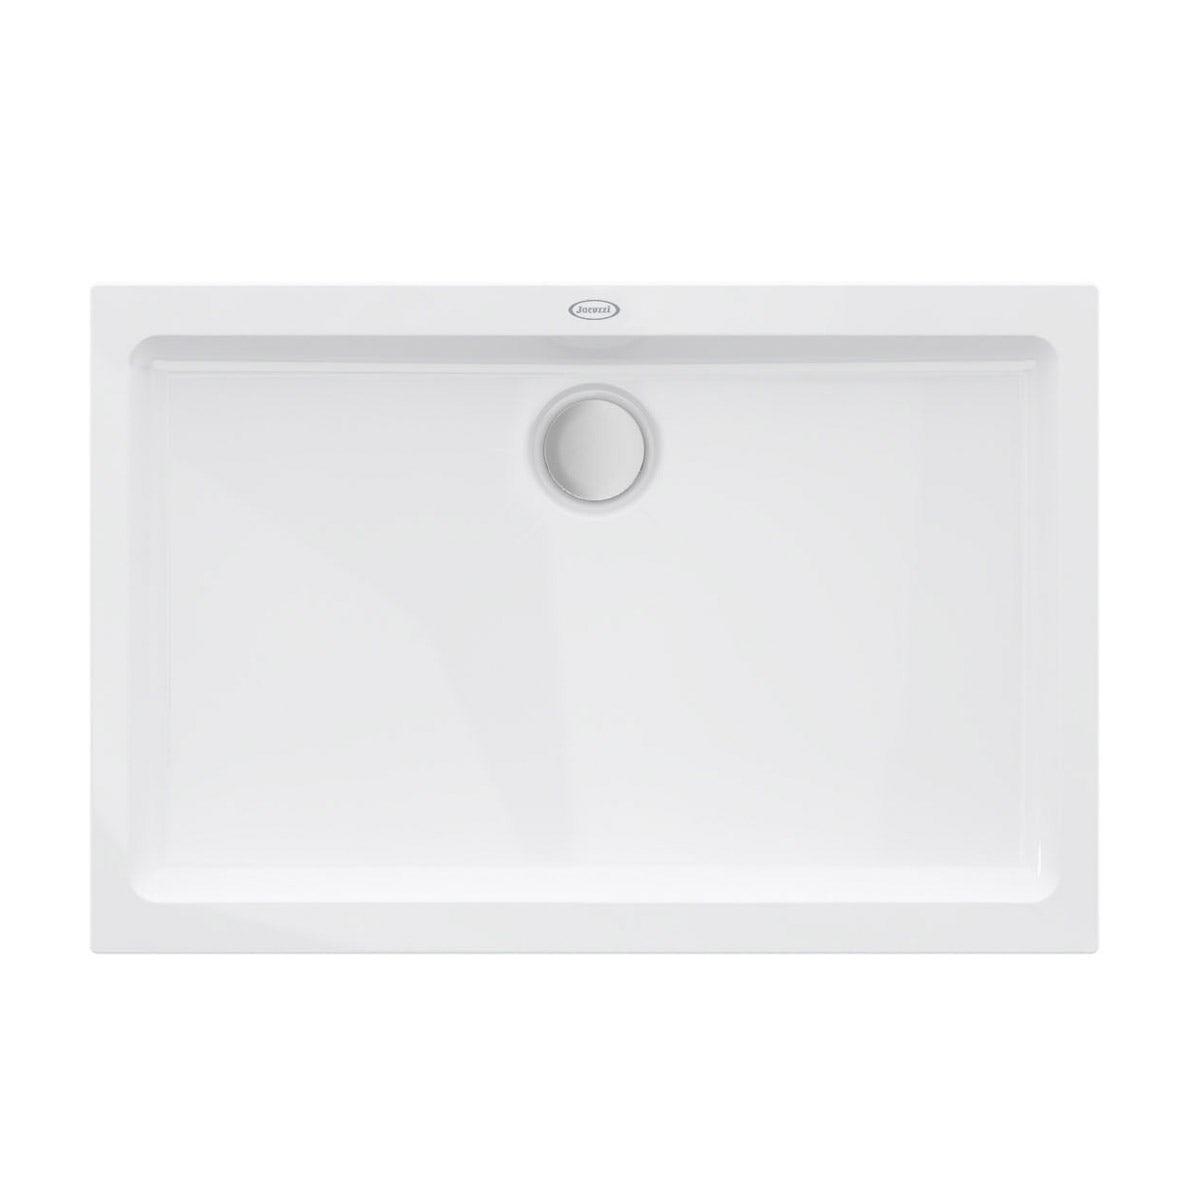 Jacuzzi Essentials matt white acrylic shower tray 1200 x 800